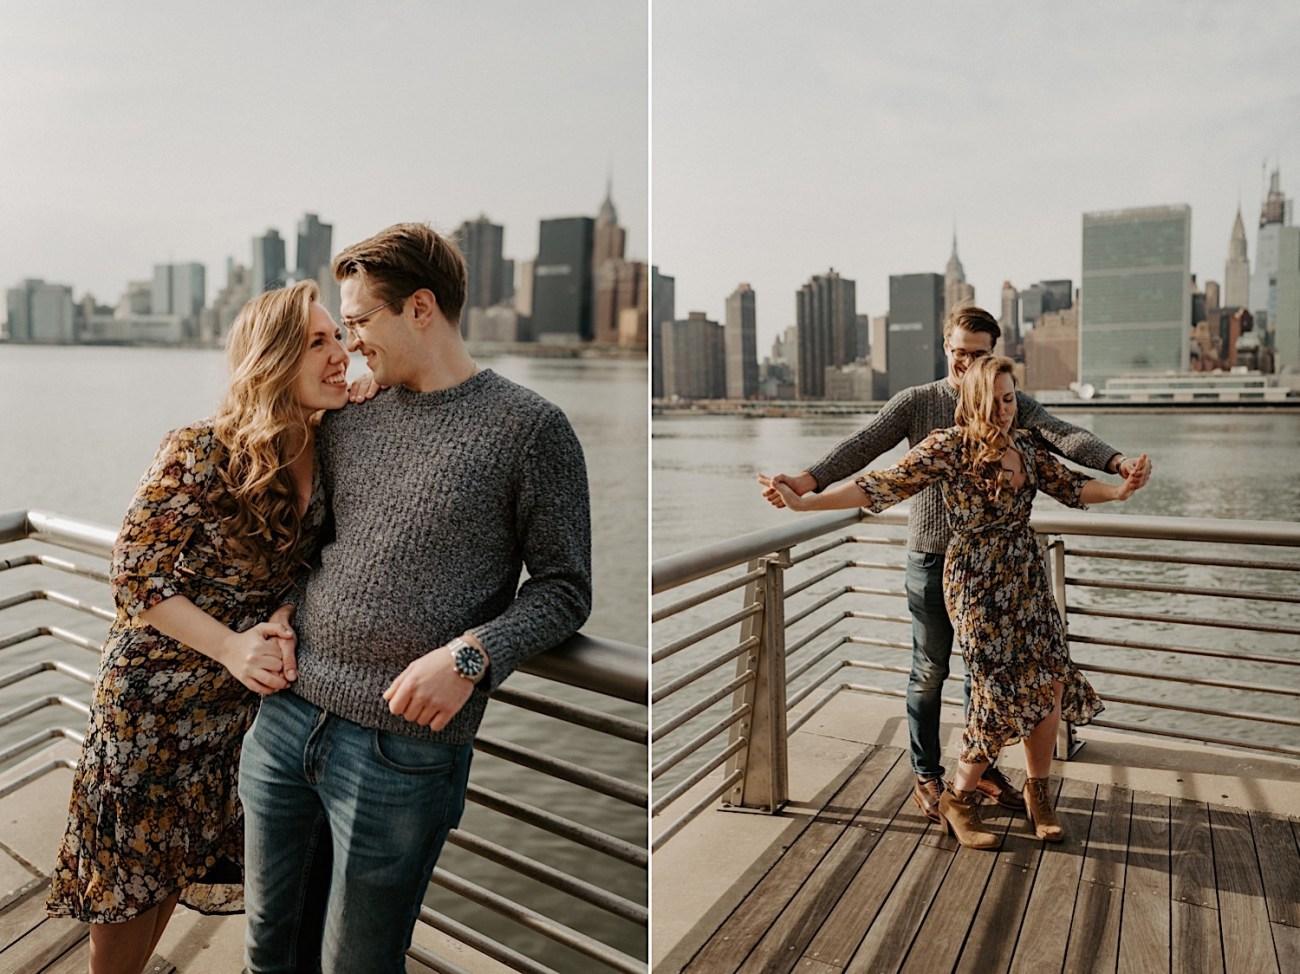 LIC Engagement Photos Pizza Engagement Photos New York Wedding Photographer LIC Boardwalk 022